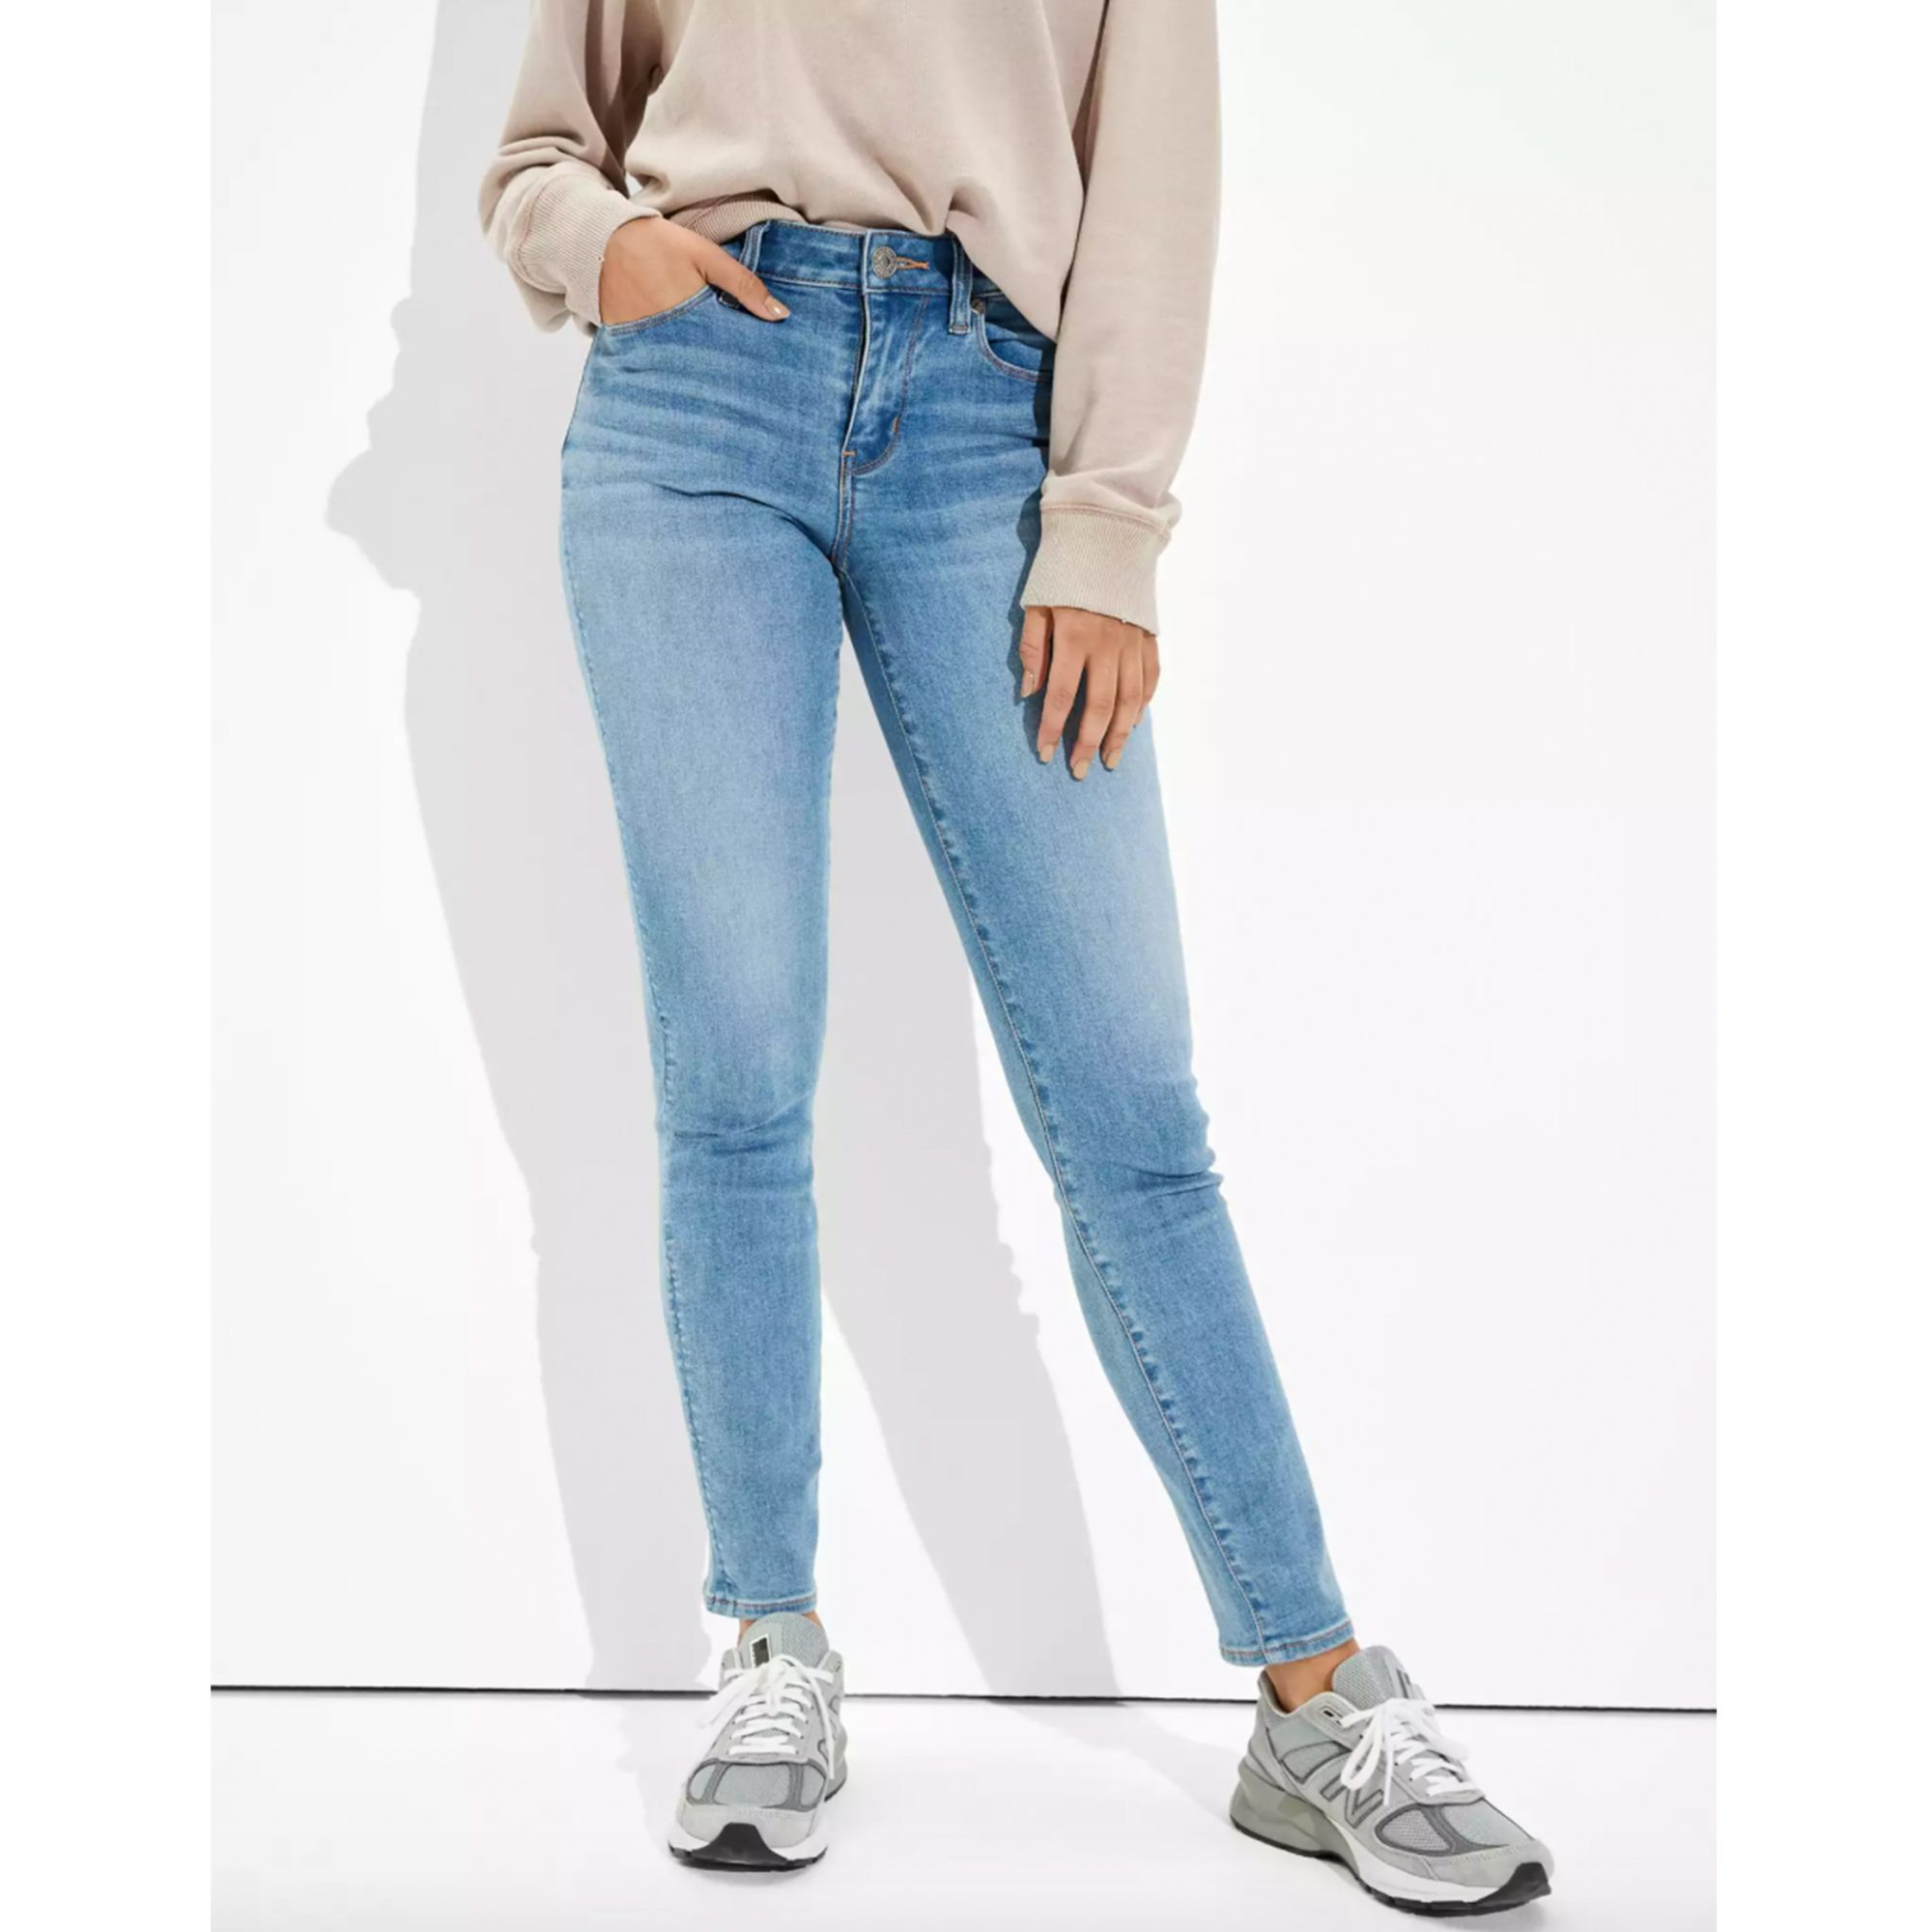 best-jeans-for-women, american-eagle-skinny-jeans